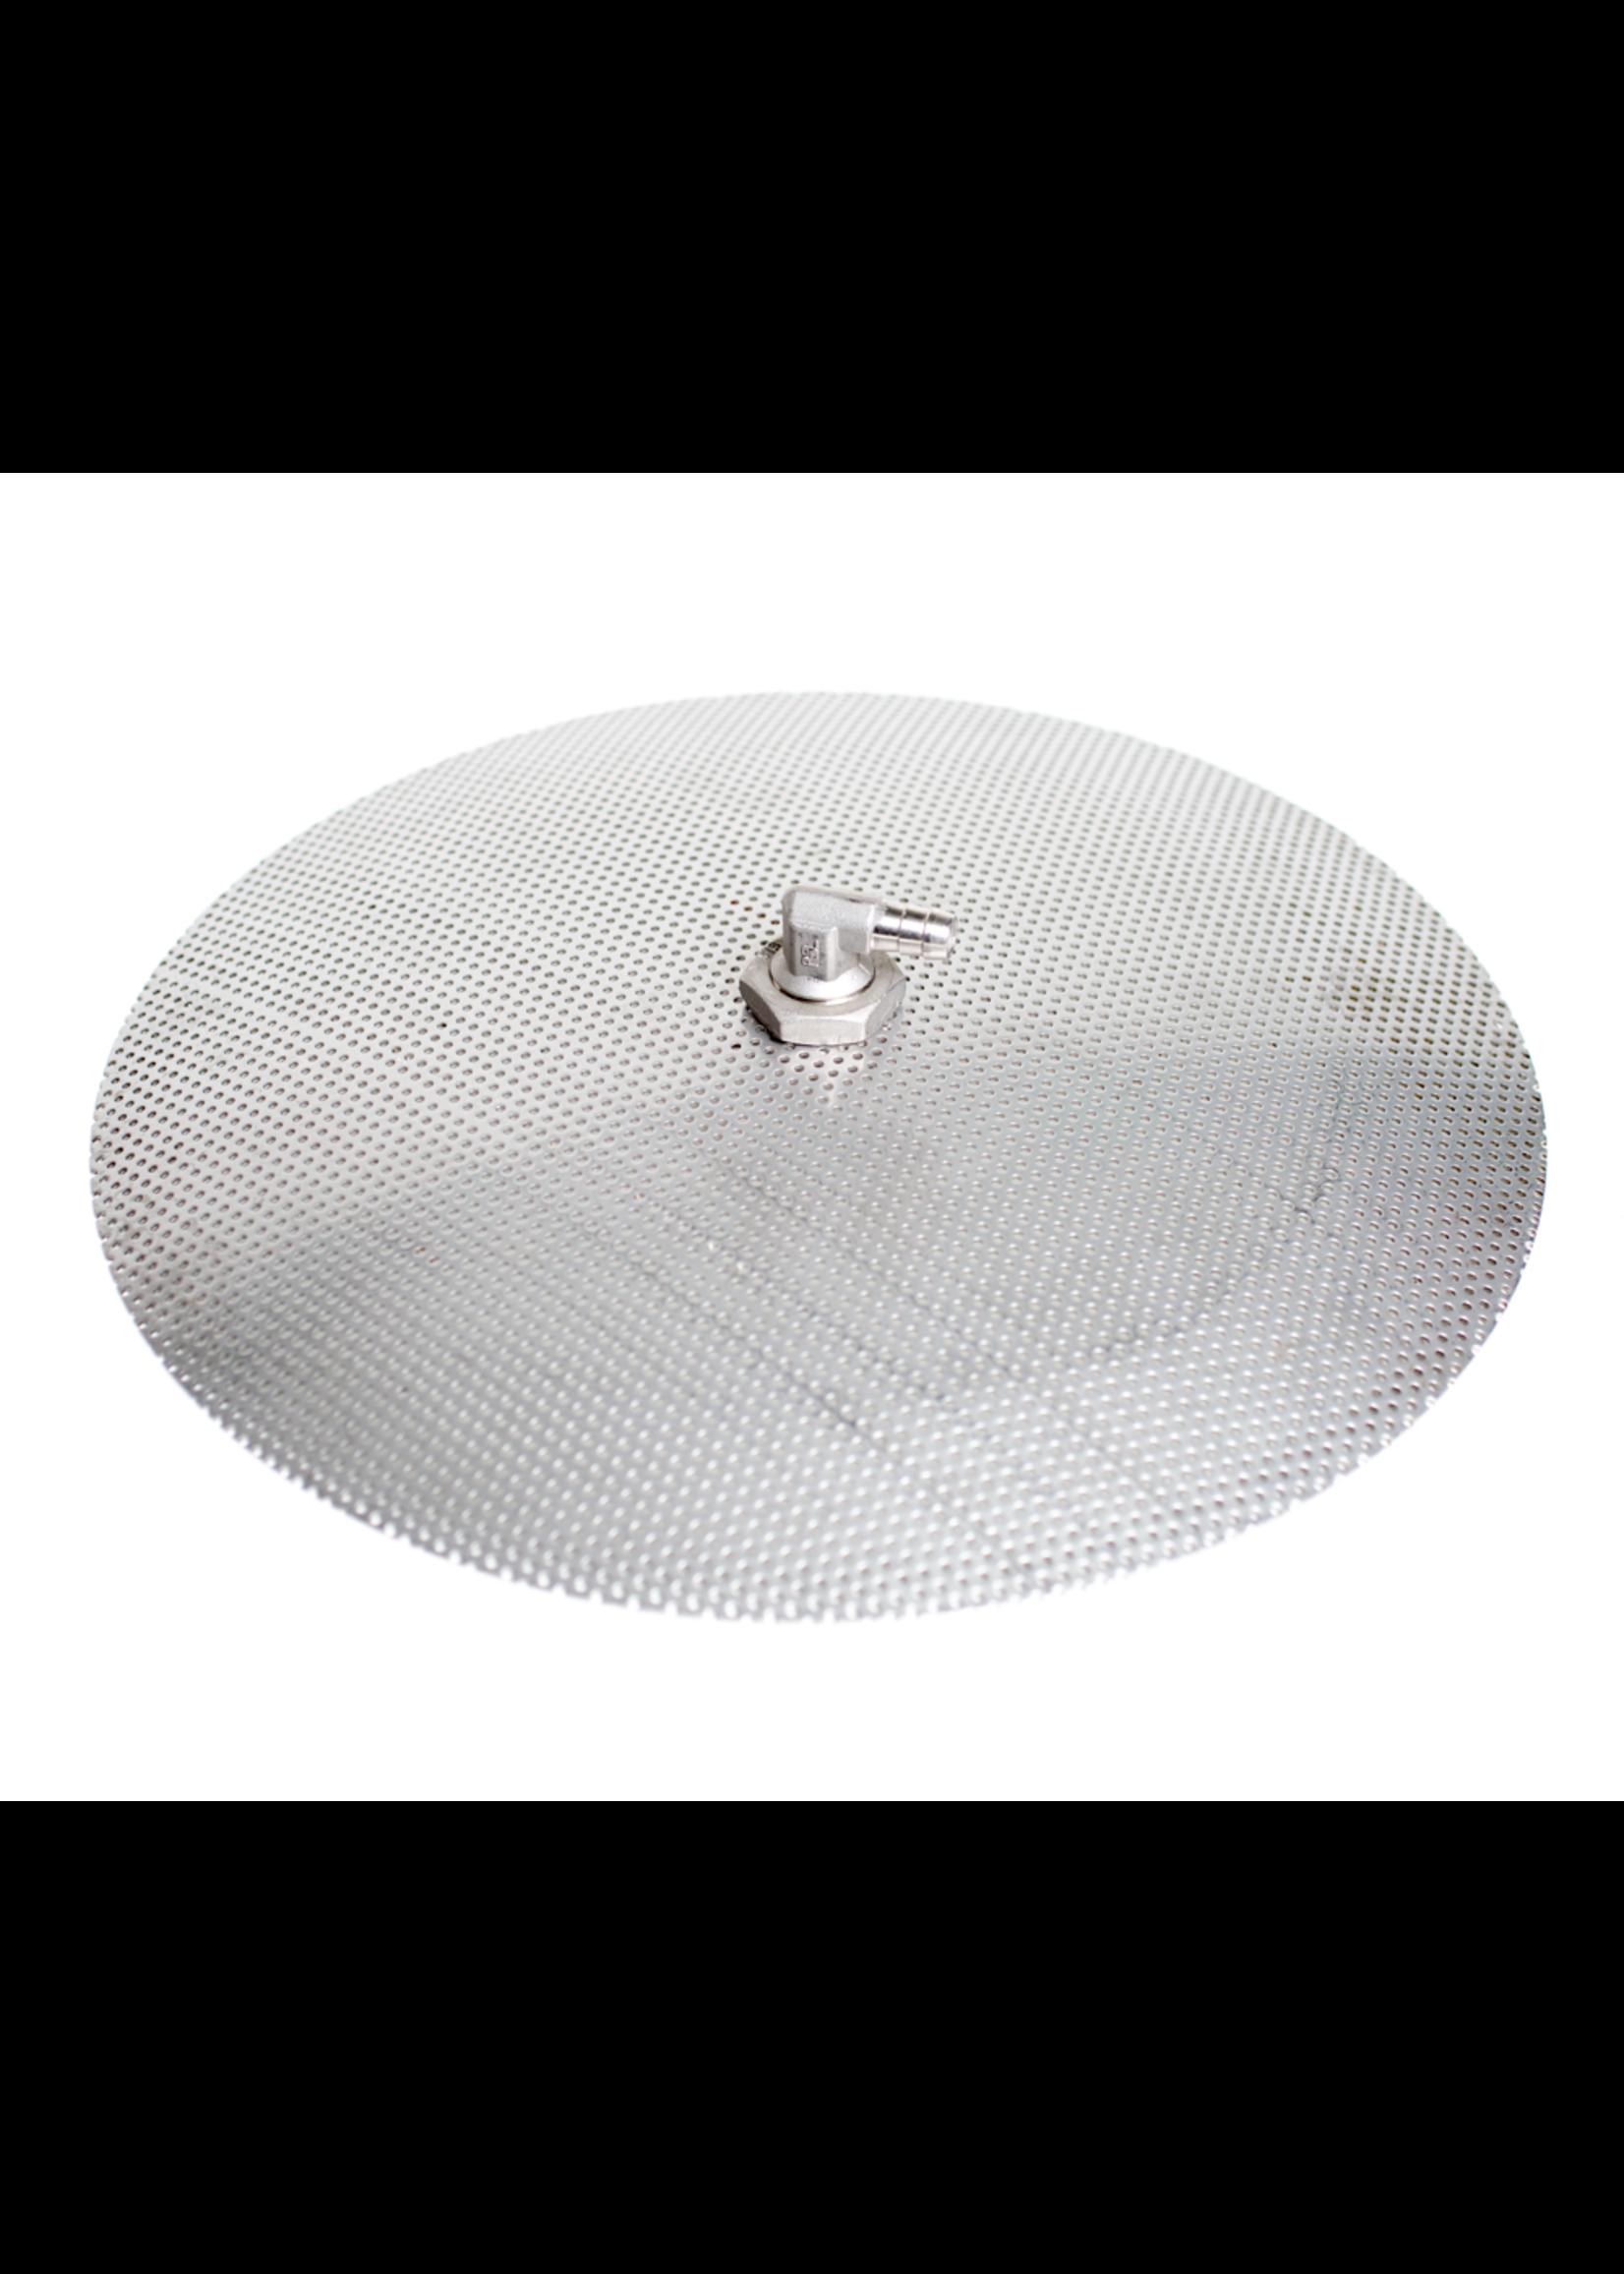 Brewing Stainless Steel Domed False Bottom 12 inch diameter w/elbo